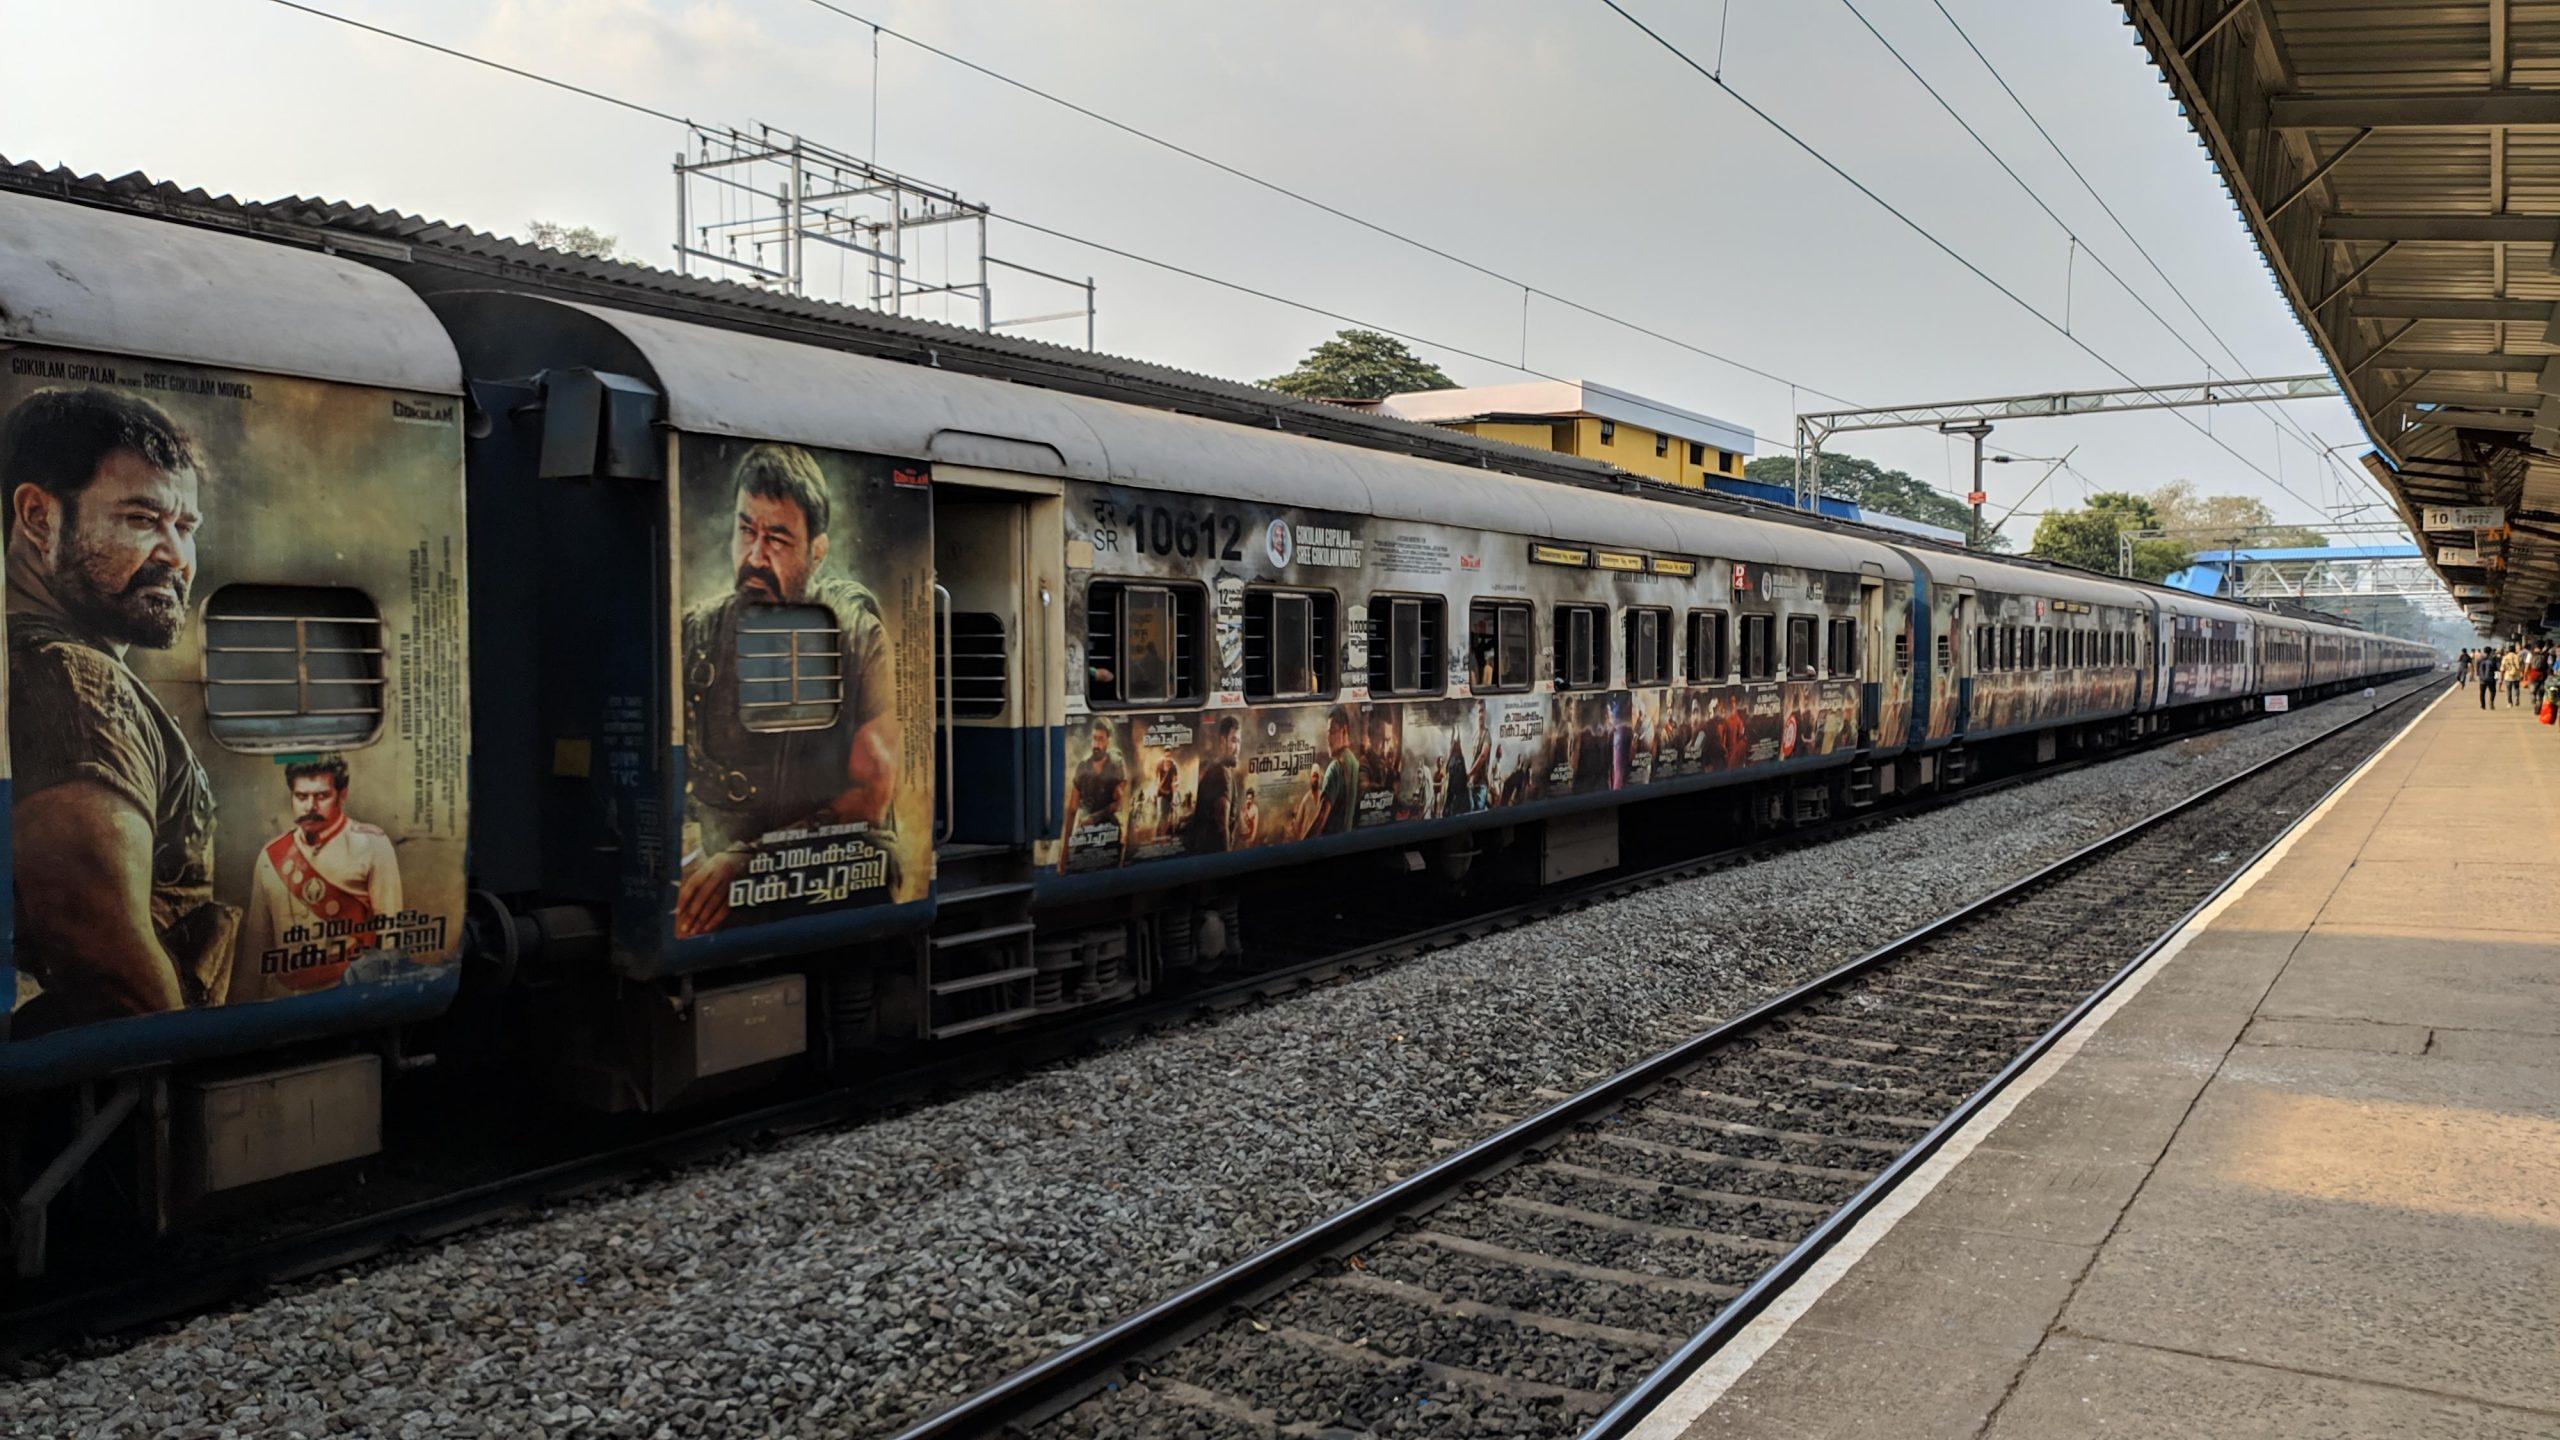 A train in a railway station